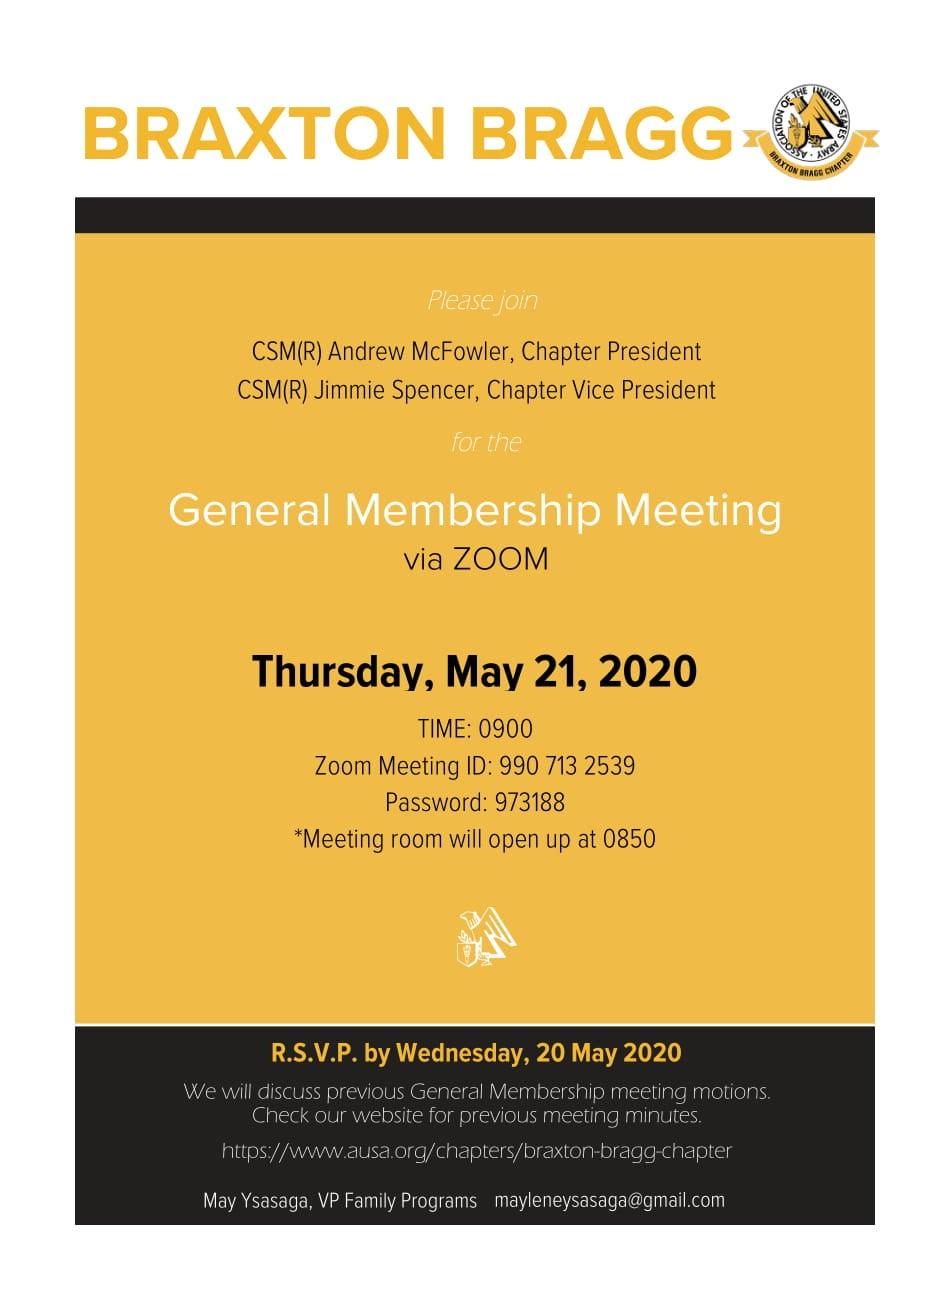 Braxton Bragg General Membership Meeting 21 May